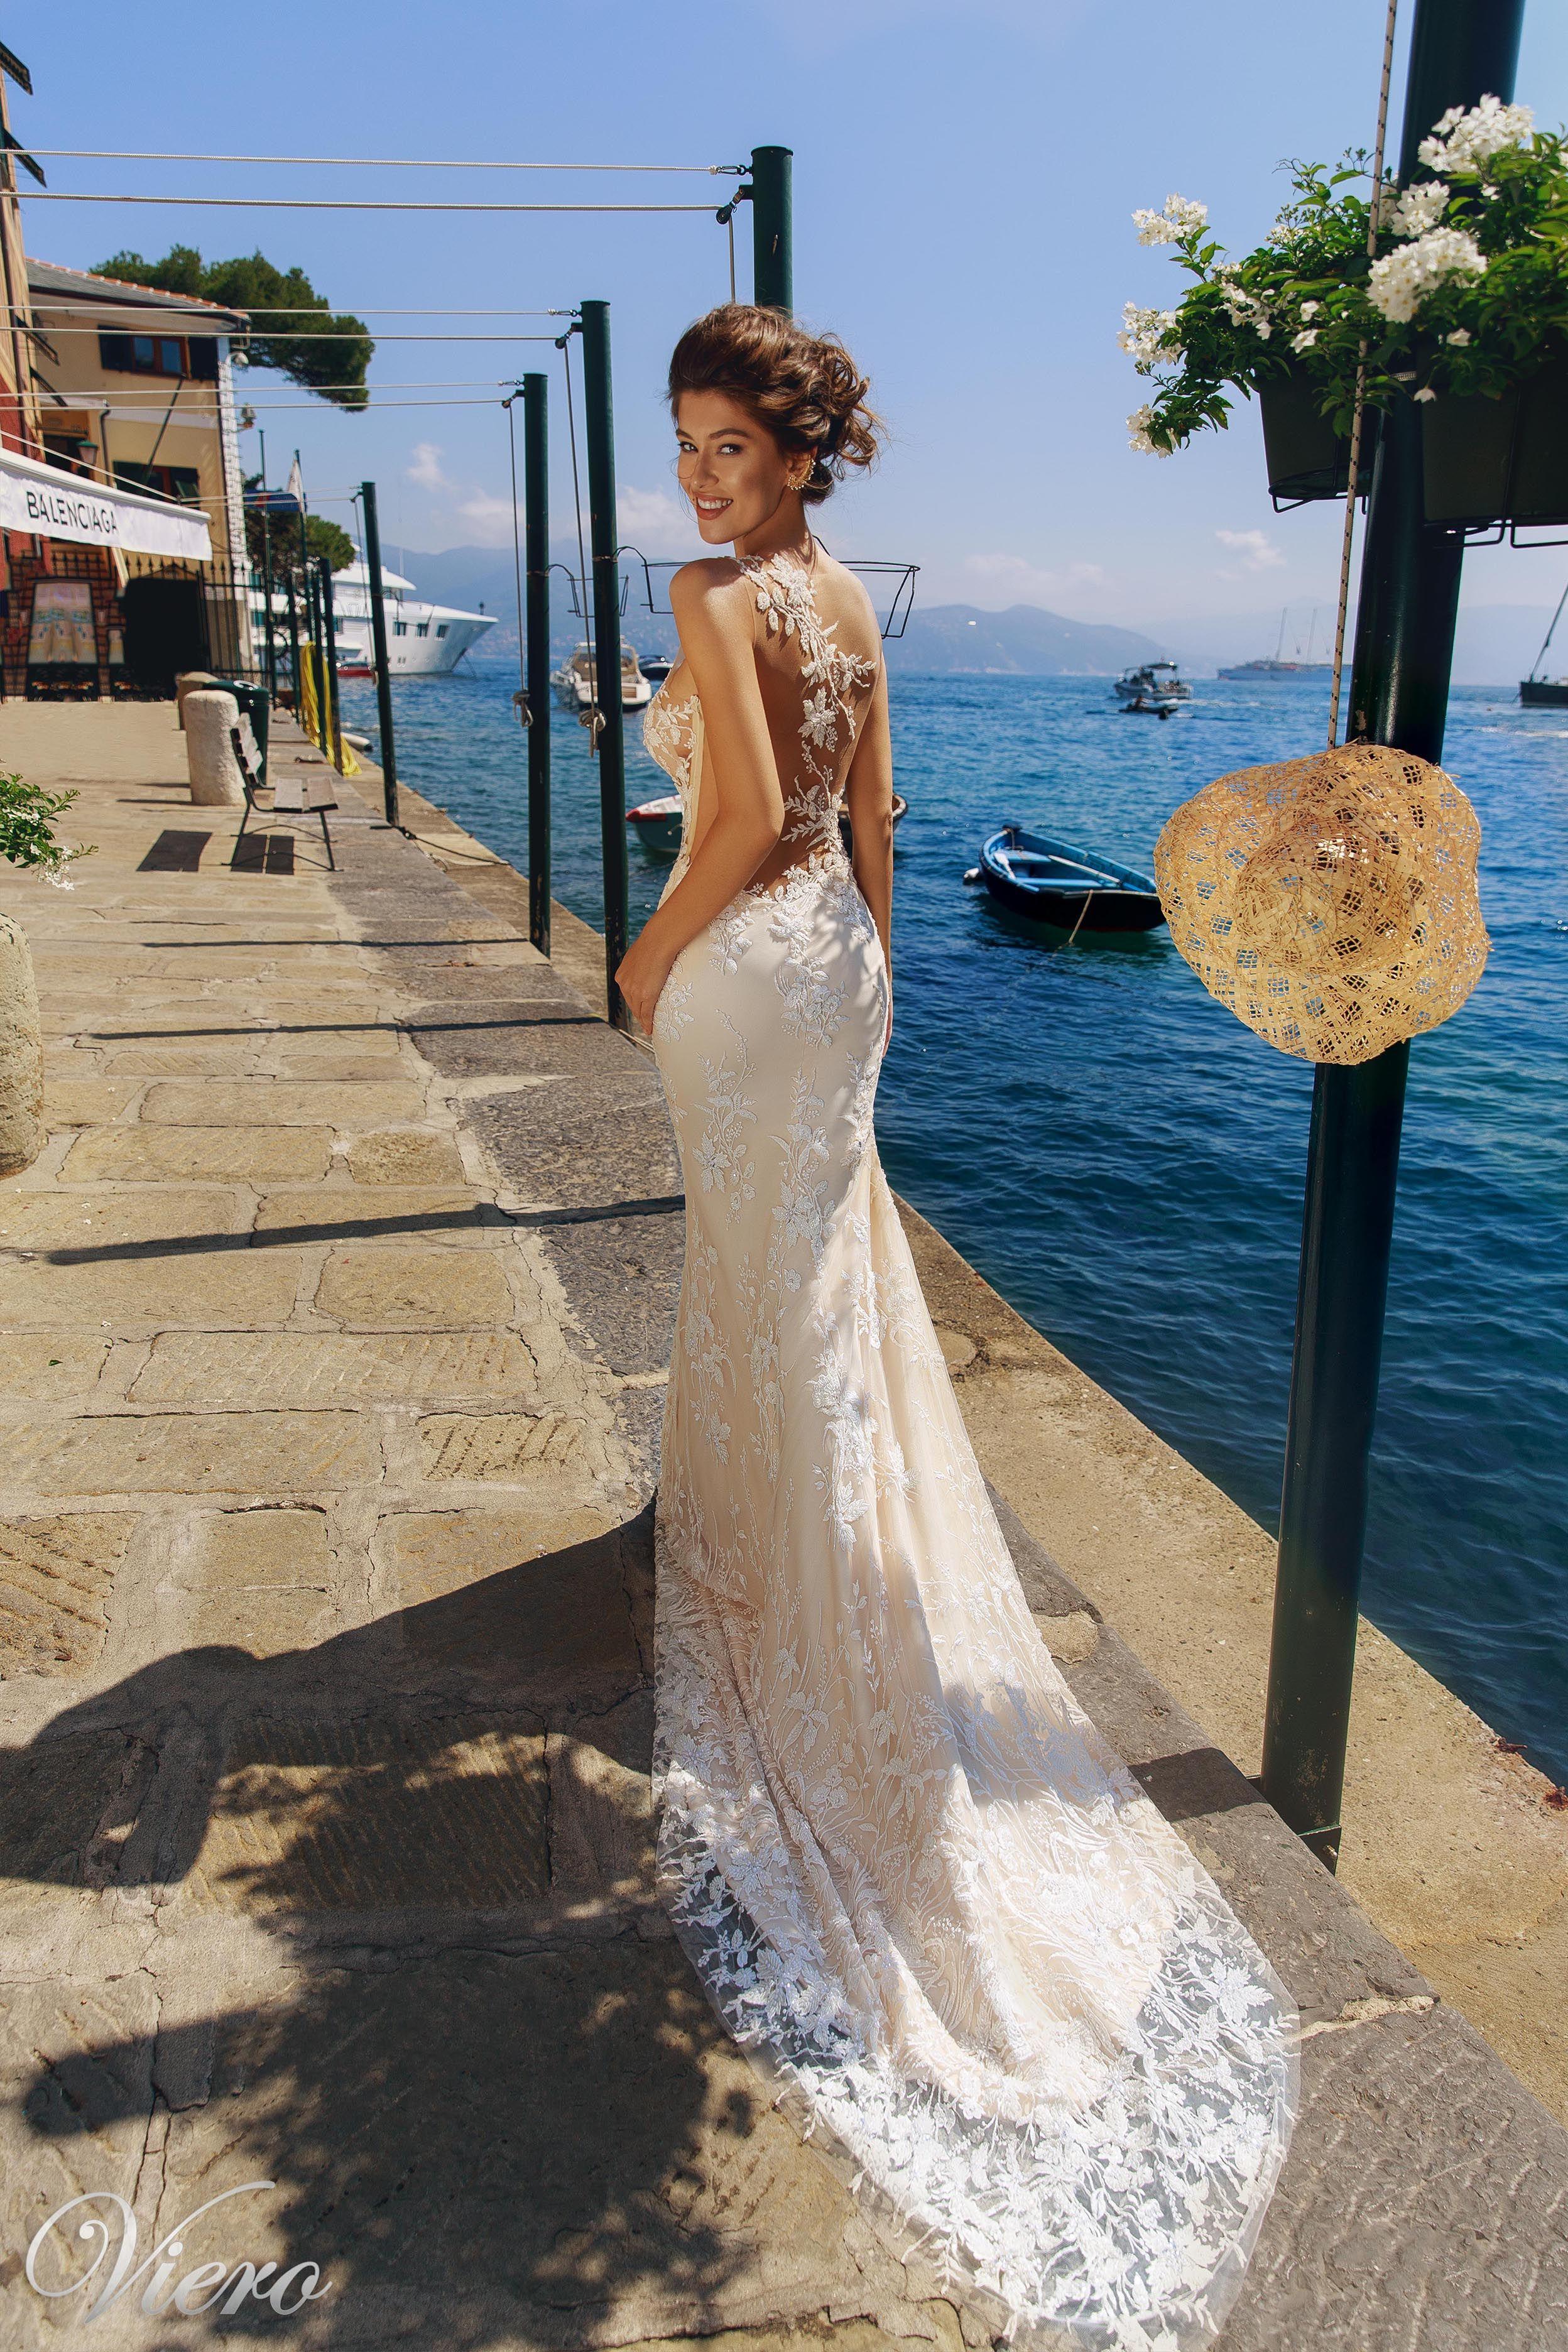 Valentina Viero Bridal Couture Wedding Dresses Wedding Dresses